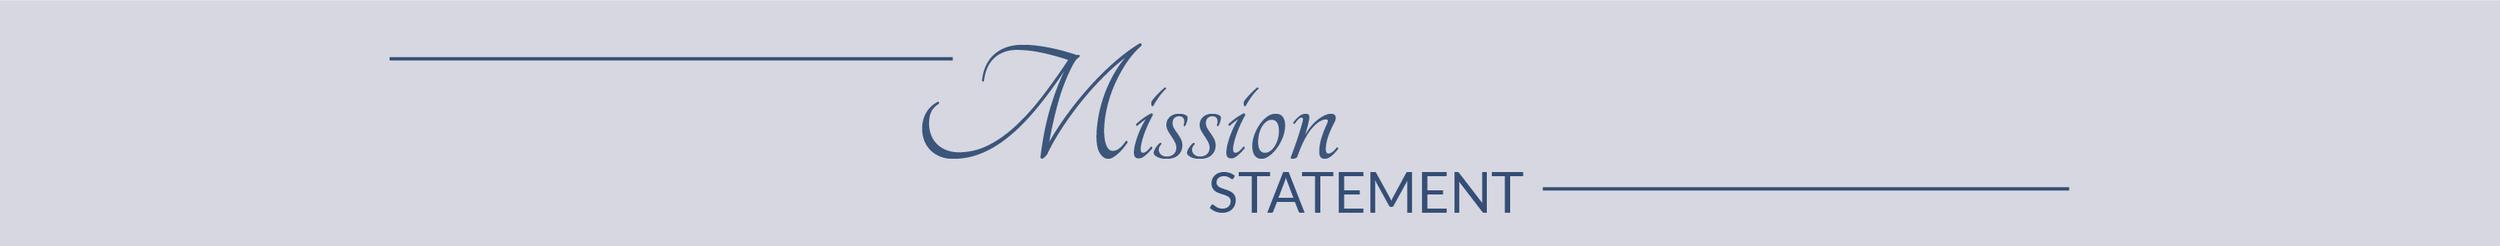 MISSION STATEMENT@4x.png